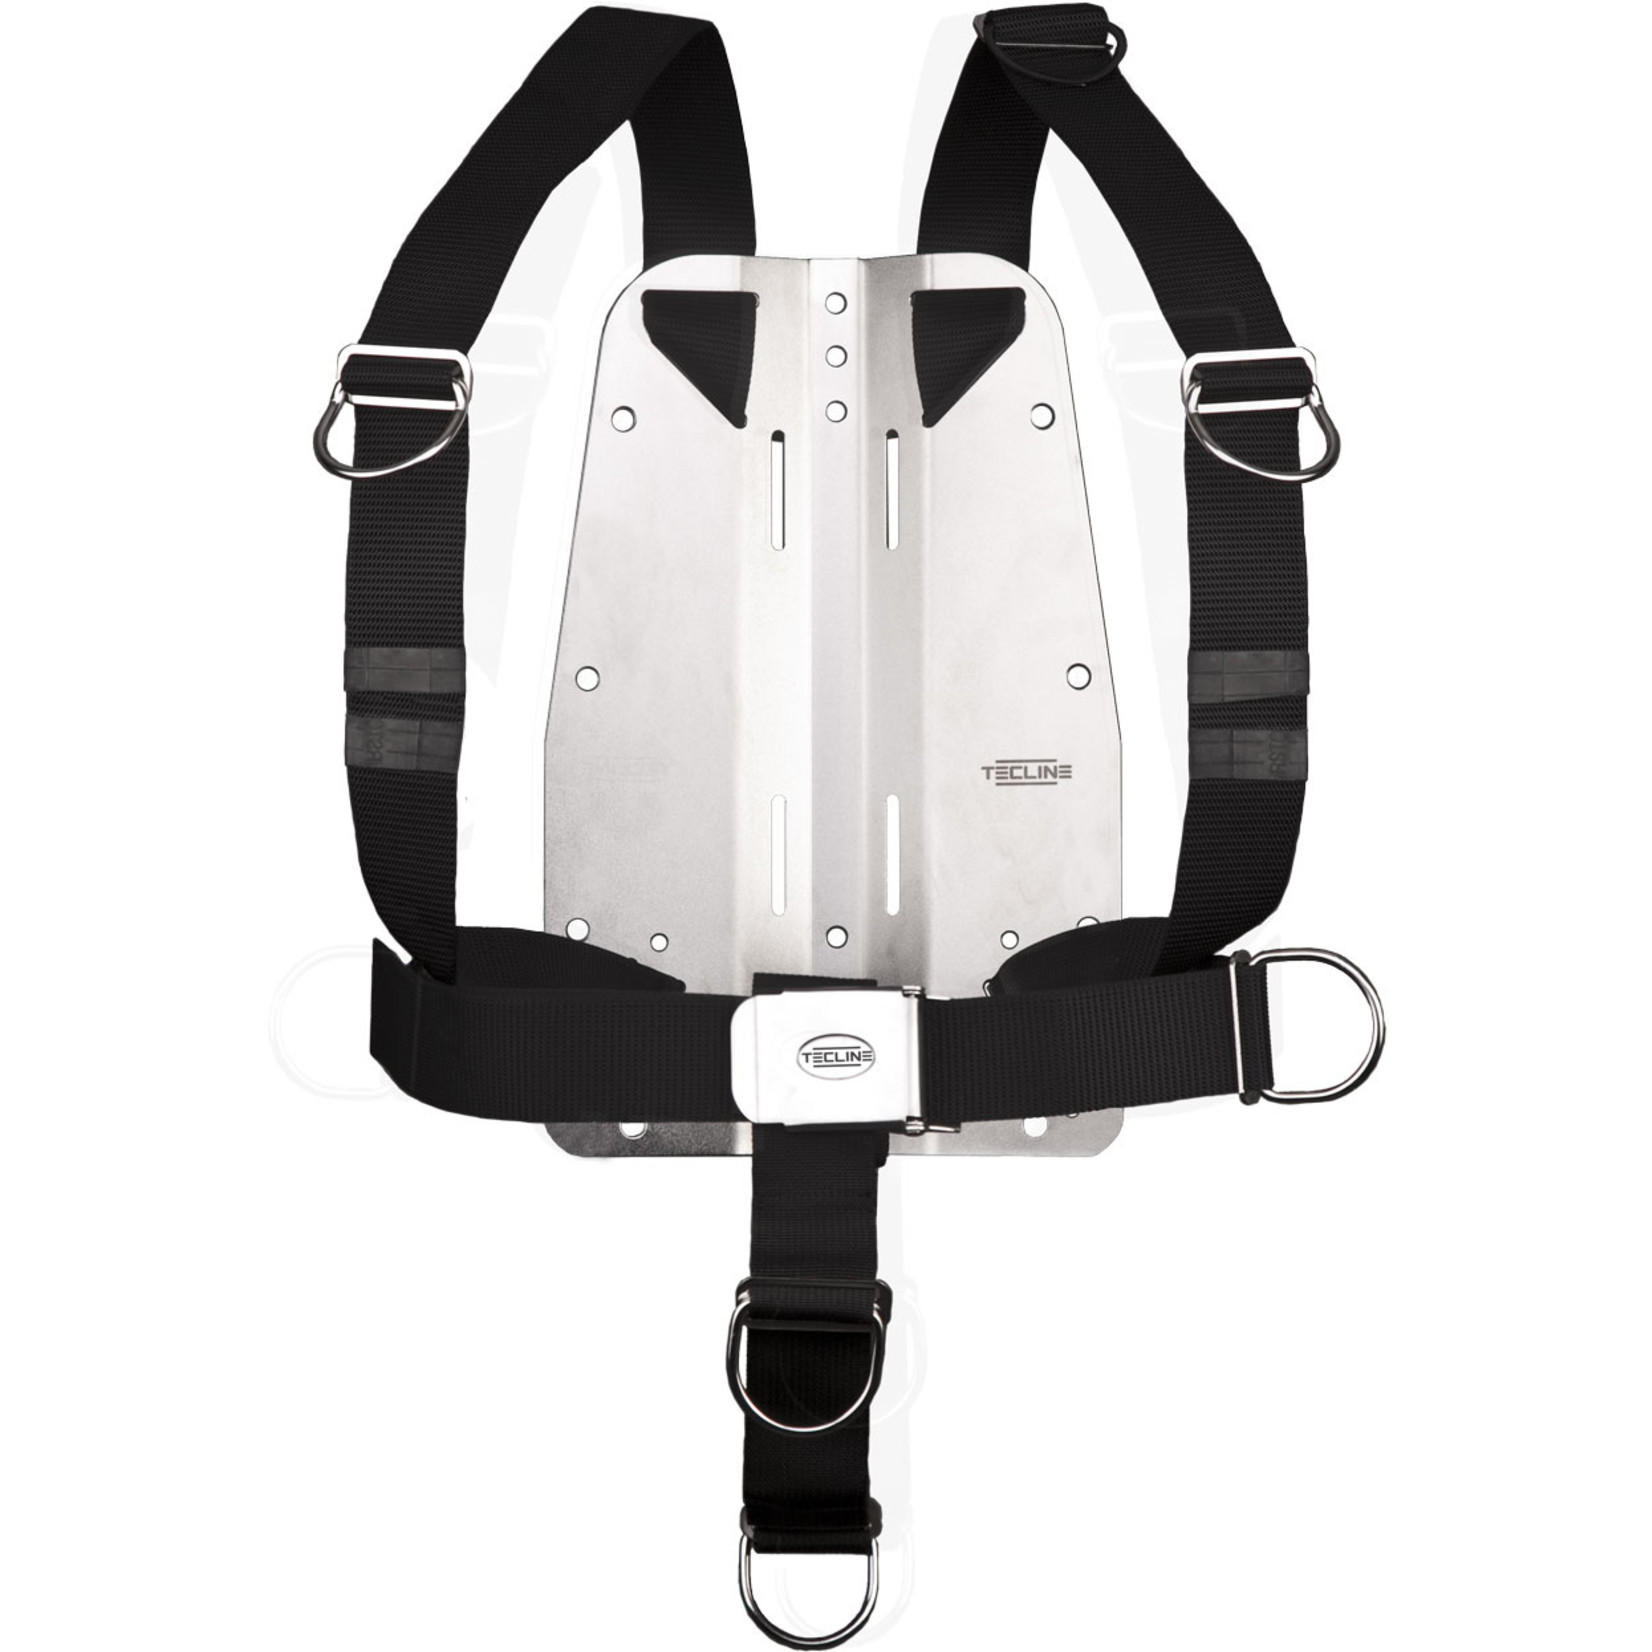 Tecline Harness TecLine DIR standard webbing - incl. 3mm RVS backplate, BP without logo